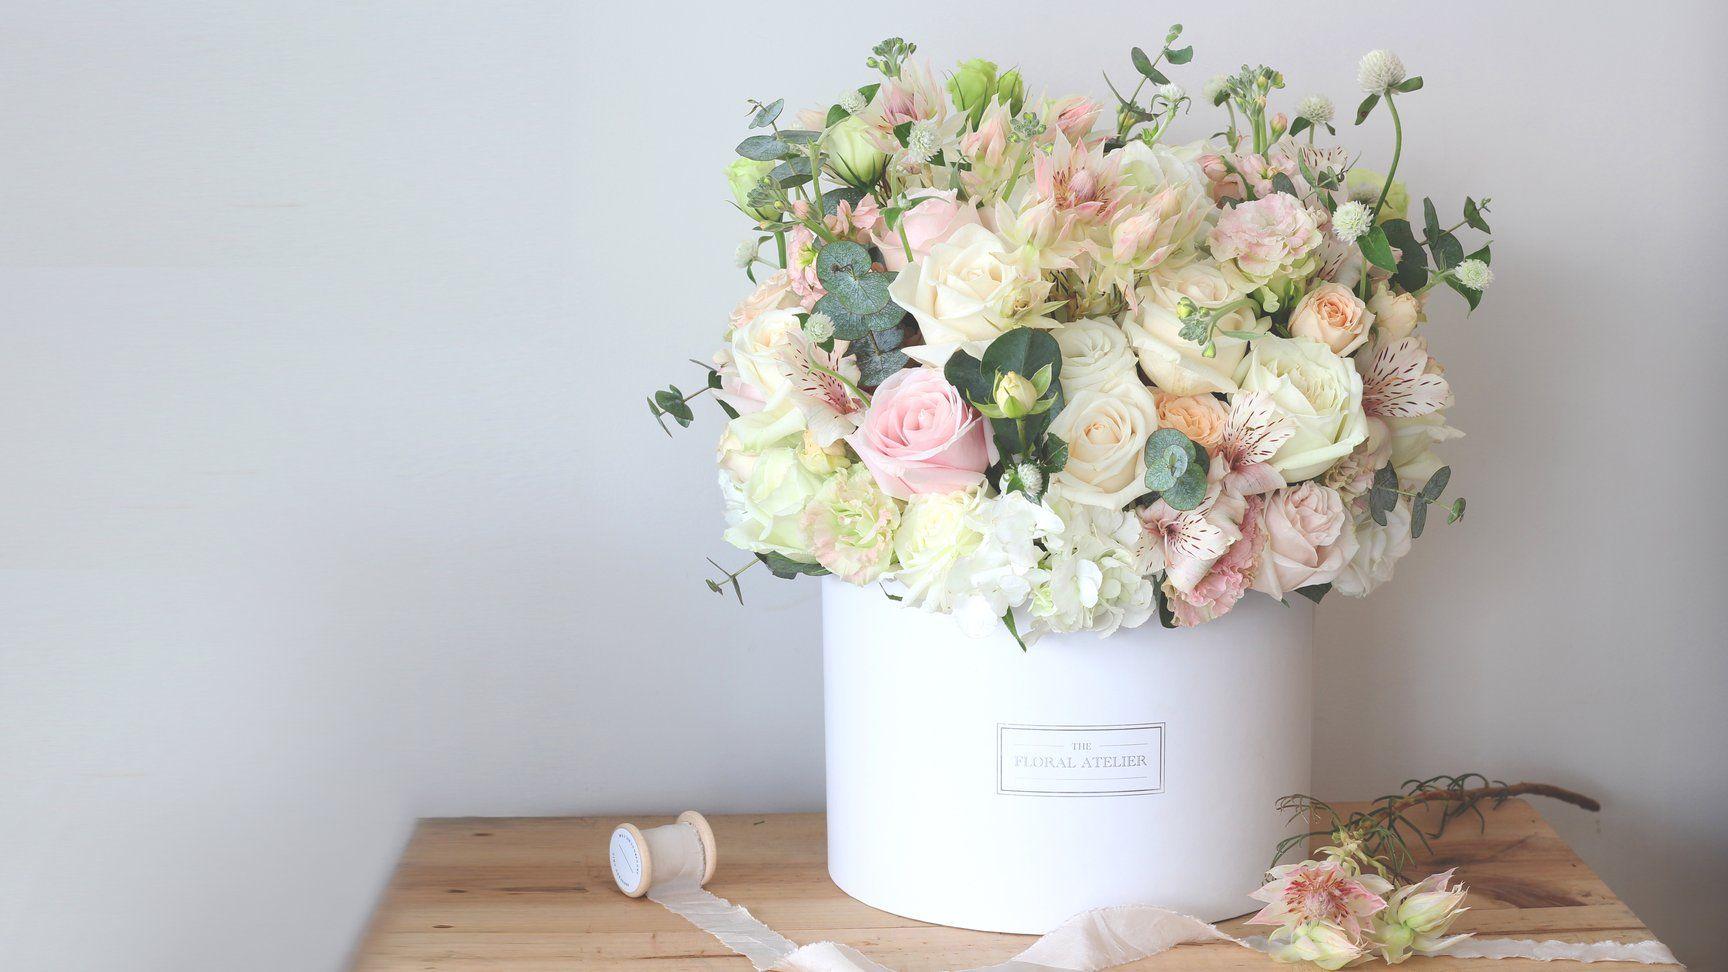 Lover Bloom Box in 2020 Online flower delivery, Floral